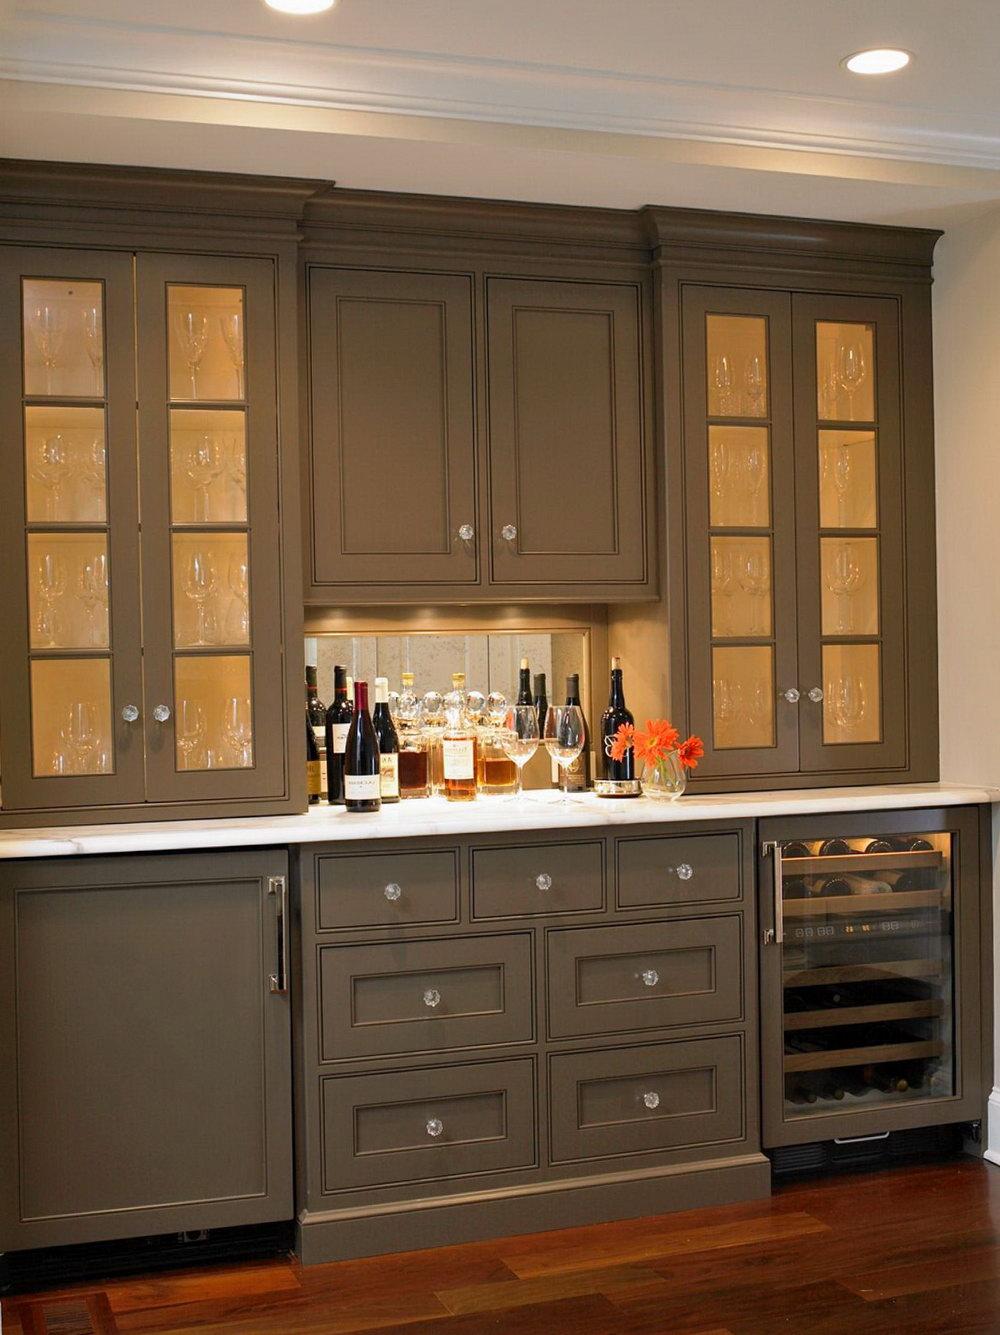 kitchen cabinets stain ideas photo - 10